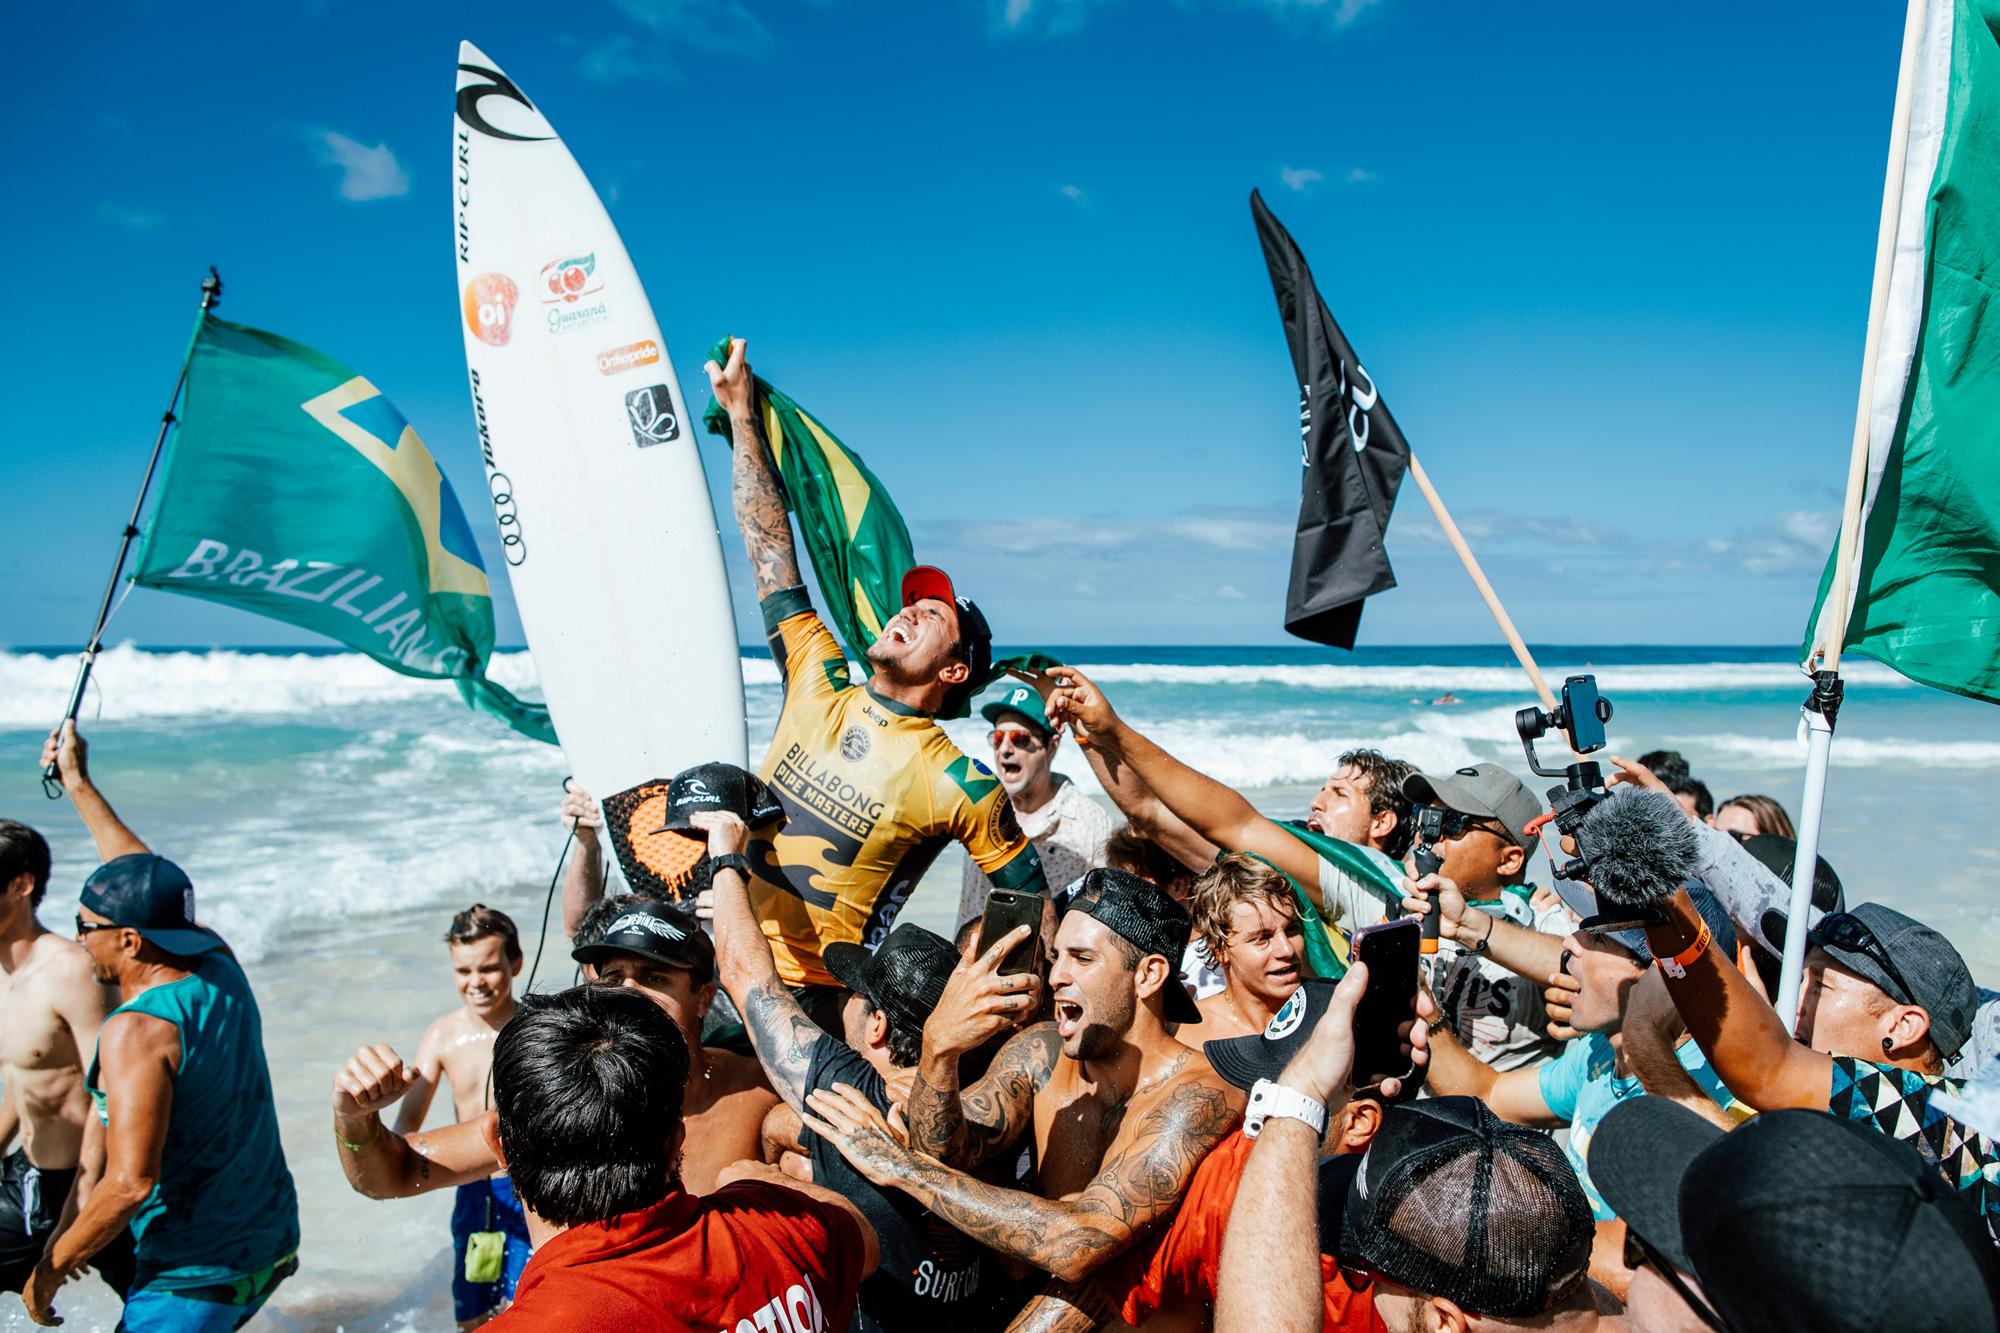 b8ccc4298b Gabriel Medina Wins World Title and Pipe Masters - Surfline